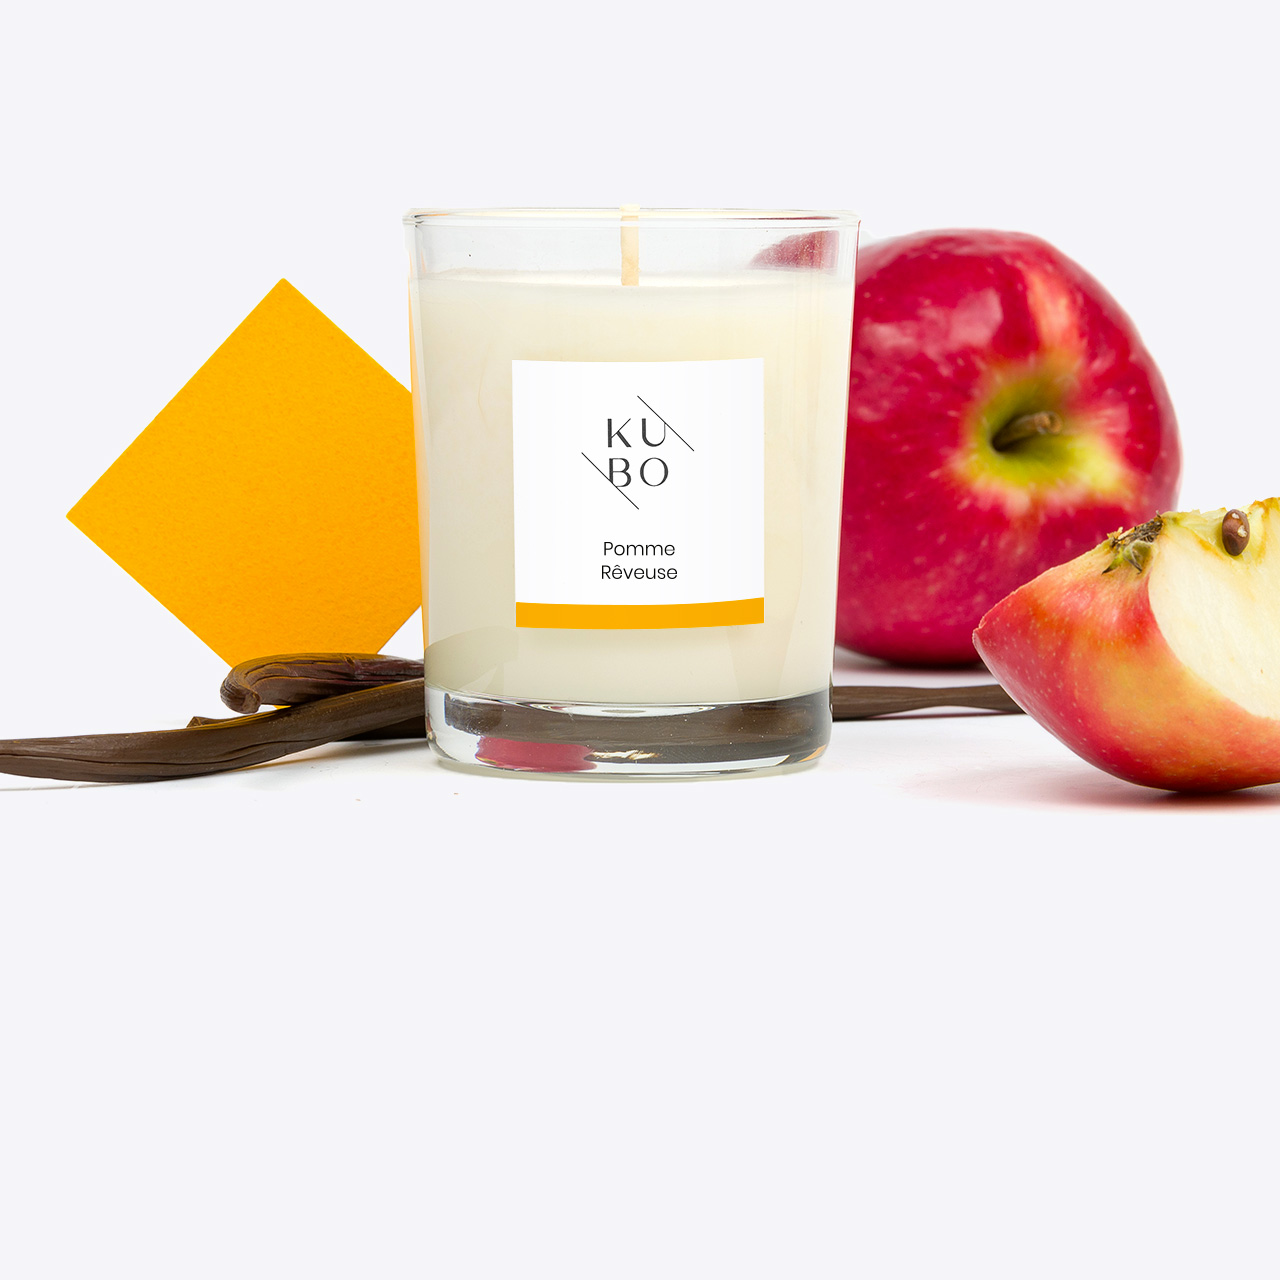 Pomme Rêveuse